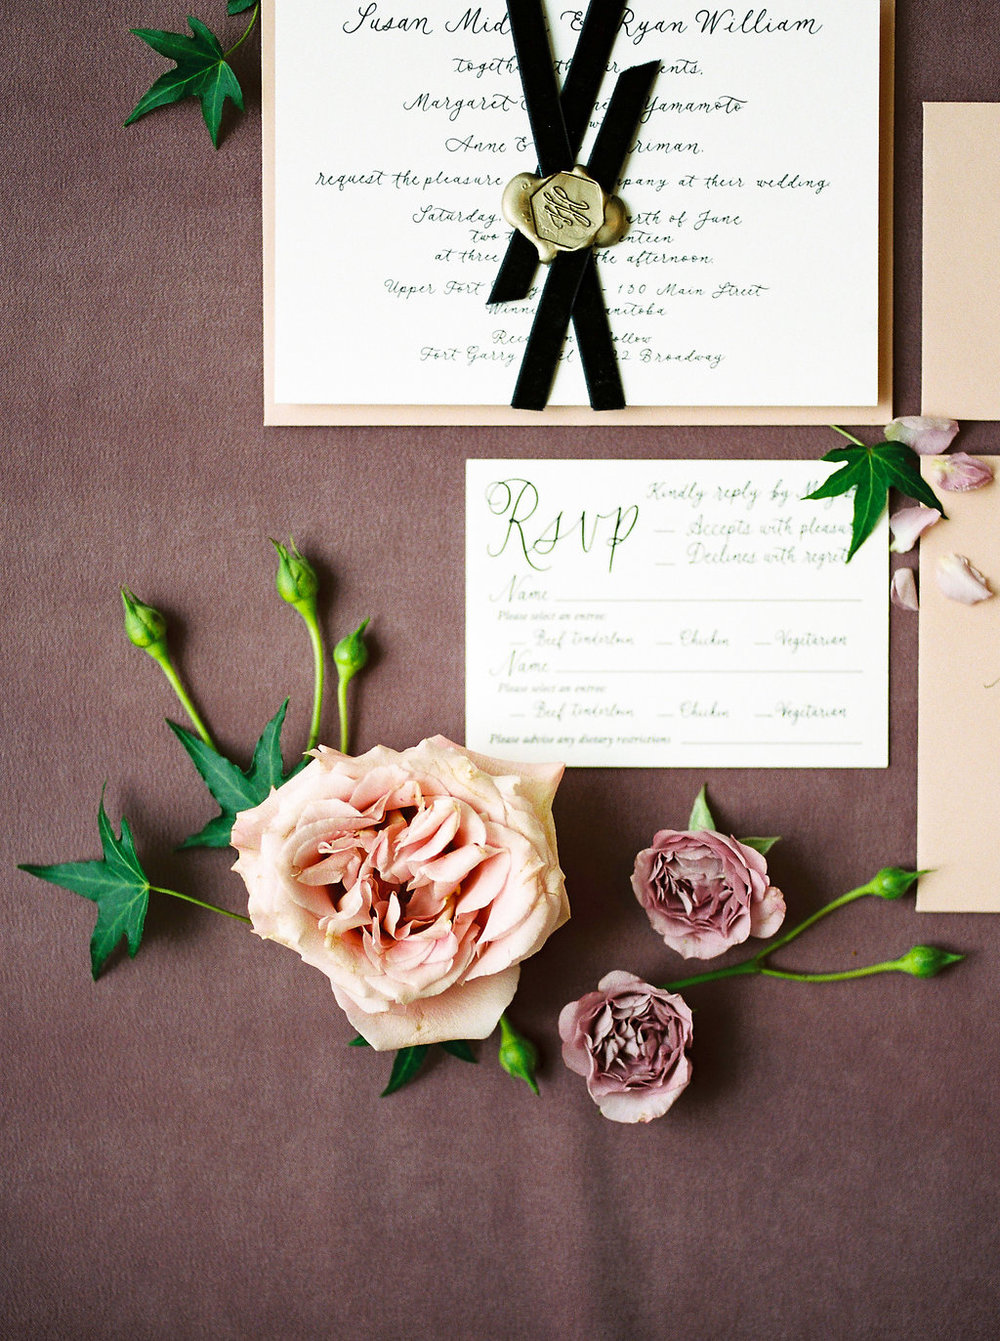 Calligraphy Wedding Invitations - Romantic Wedding Inspiration